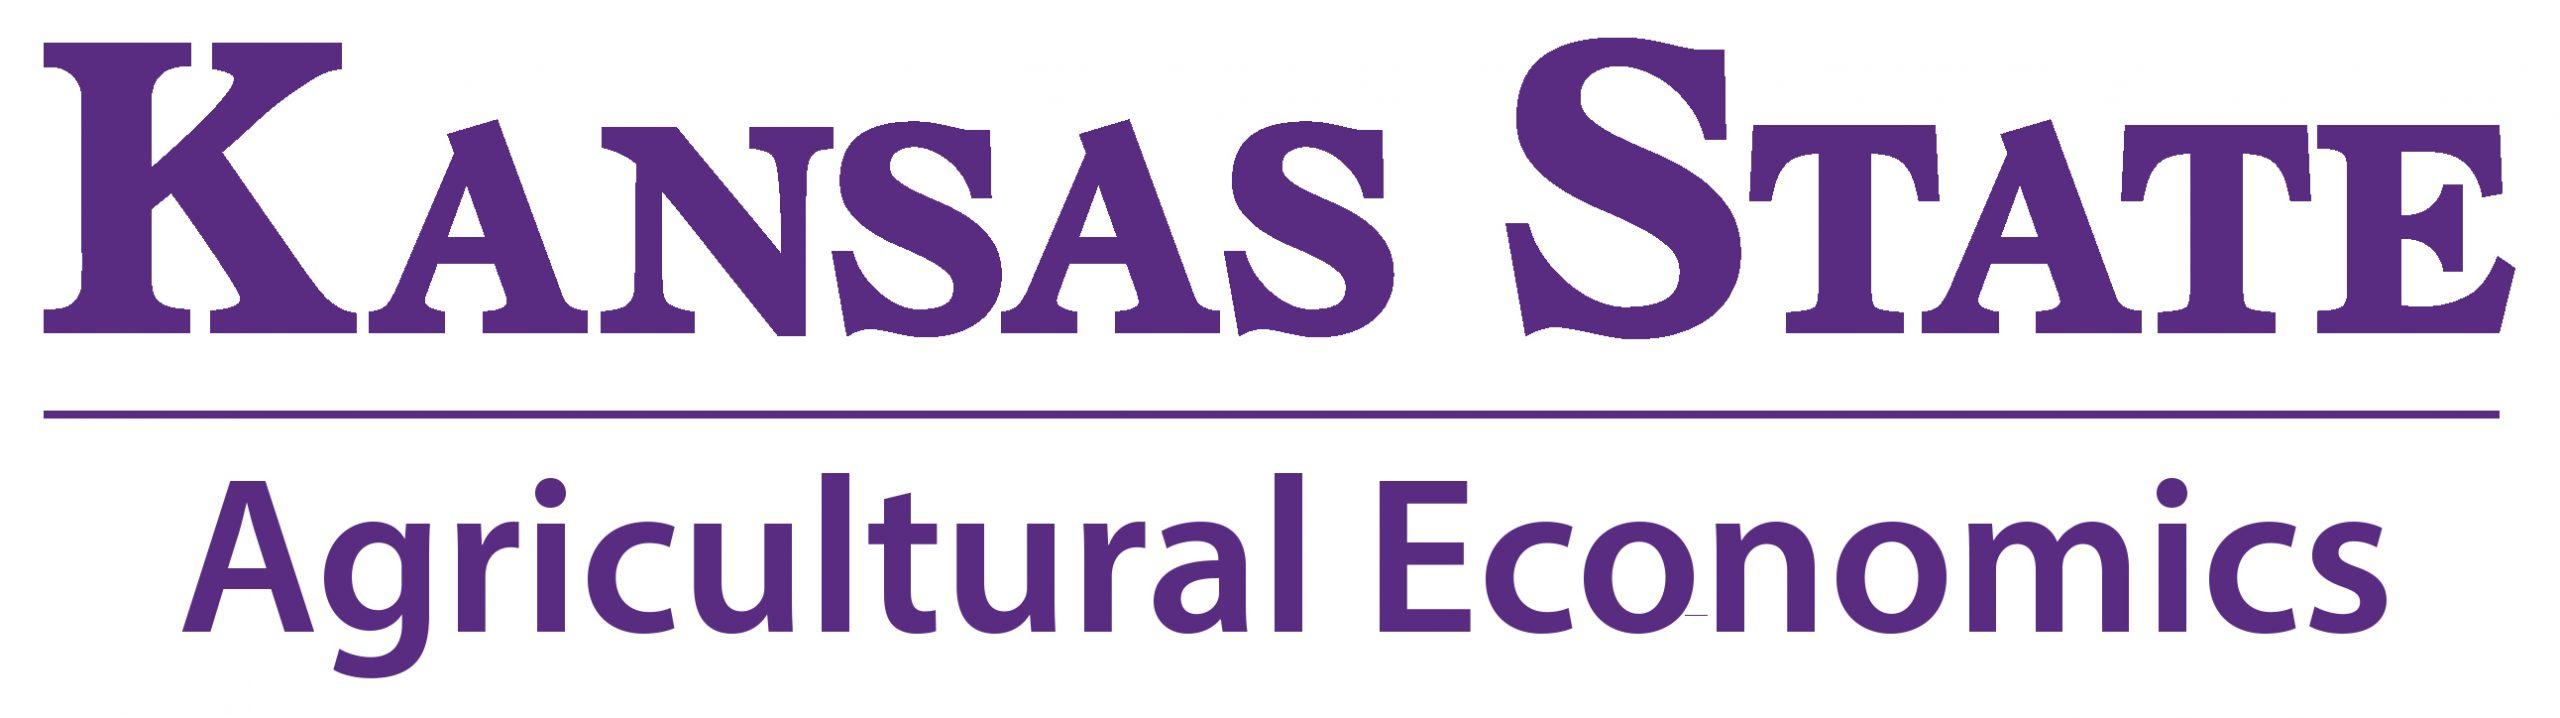 Kansas State University Agricultural Economics